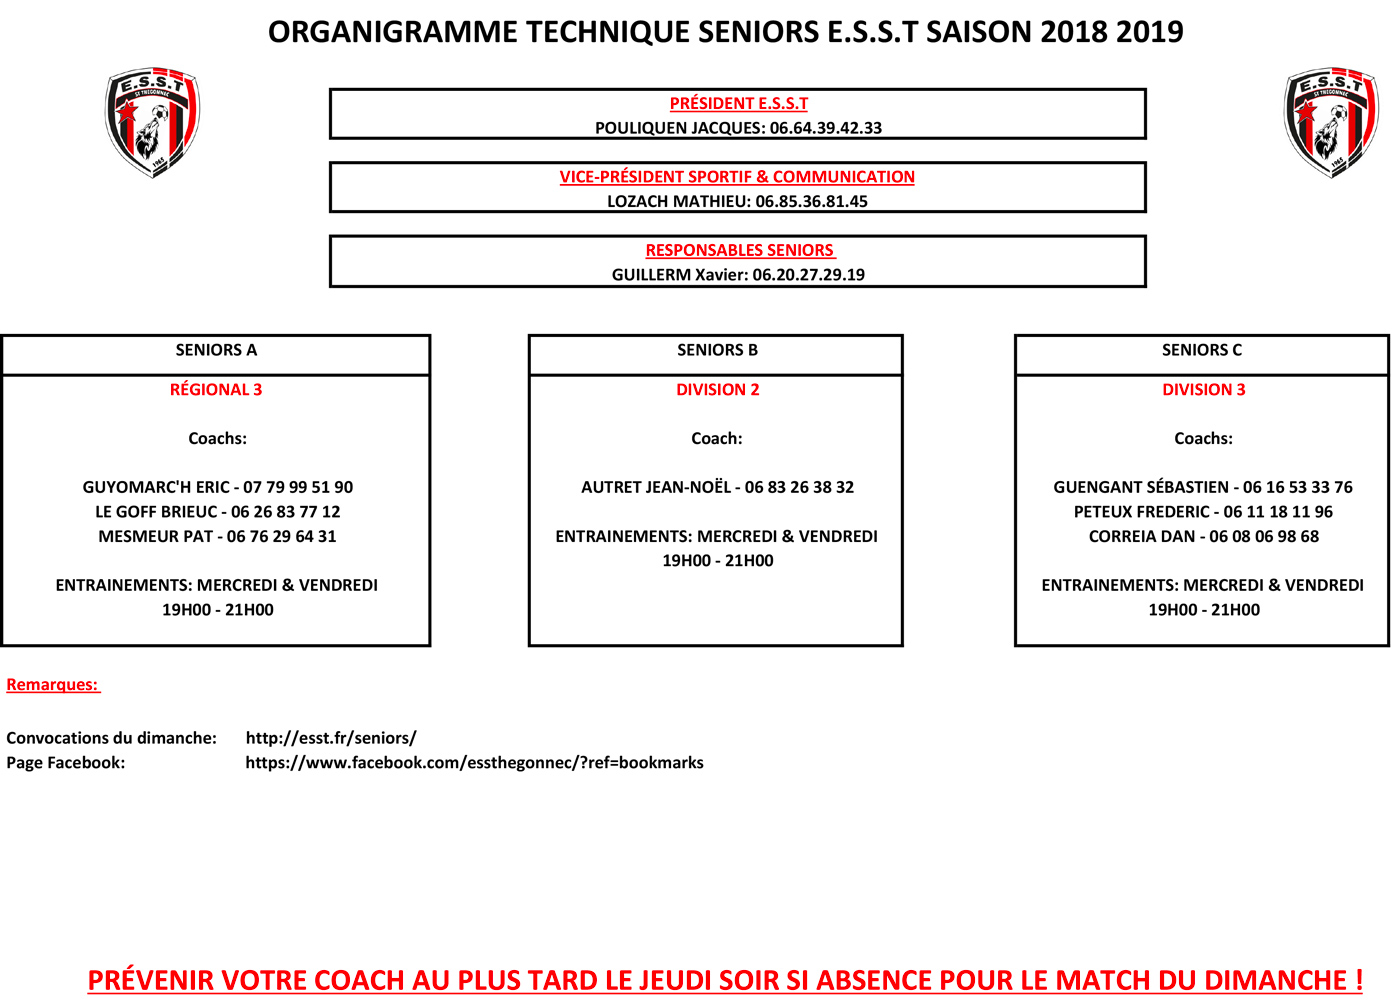 ORGANIGRAMME-TECHNIQUE-SENIORS-E.S.S.T-SAISON-2018-2019